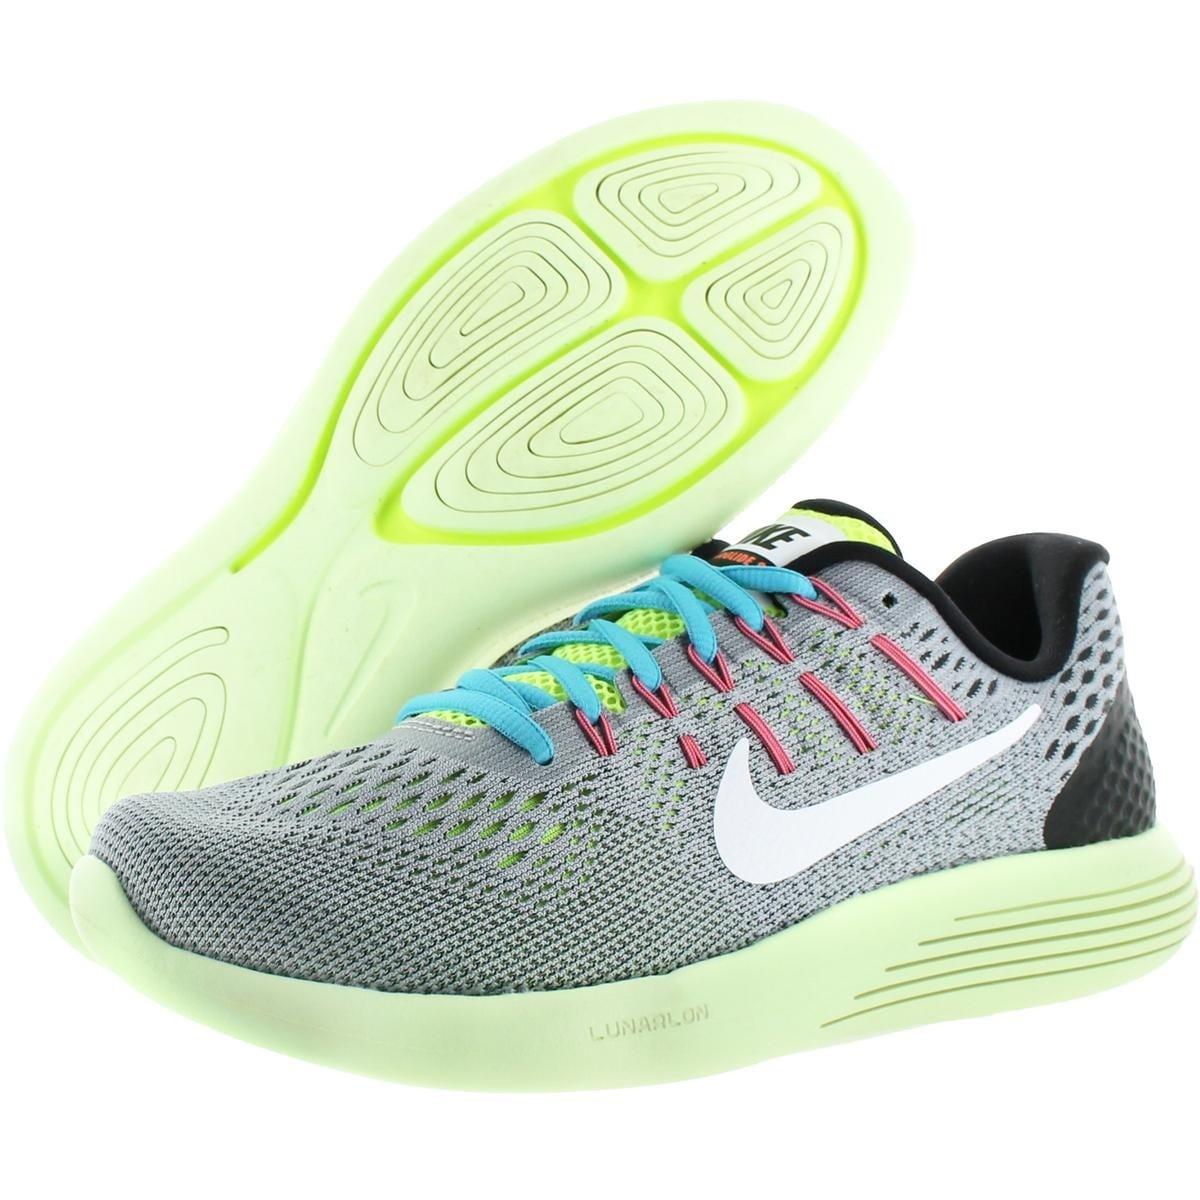 cheap for discount 3e667 1194f Nike Mens Lunarglide 8 Running Shoes Mesh Run Easy